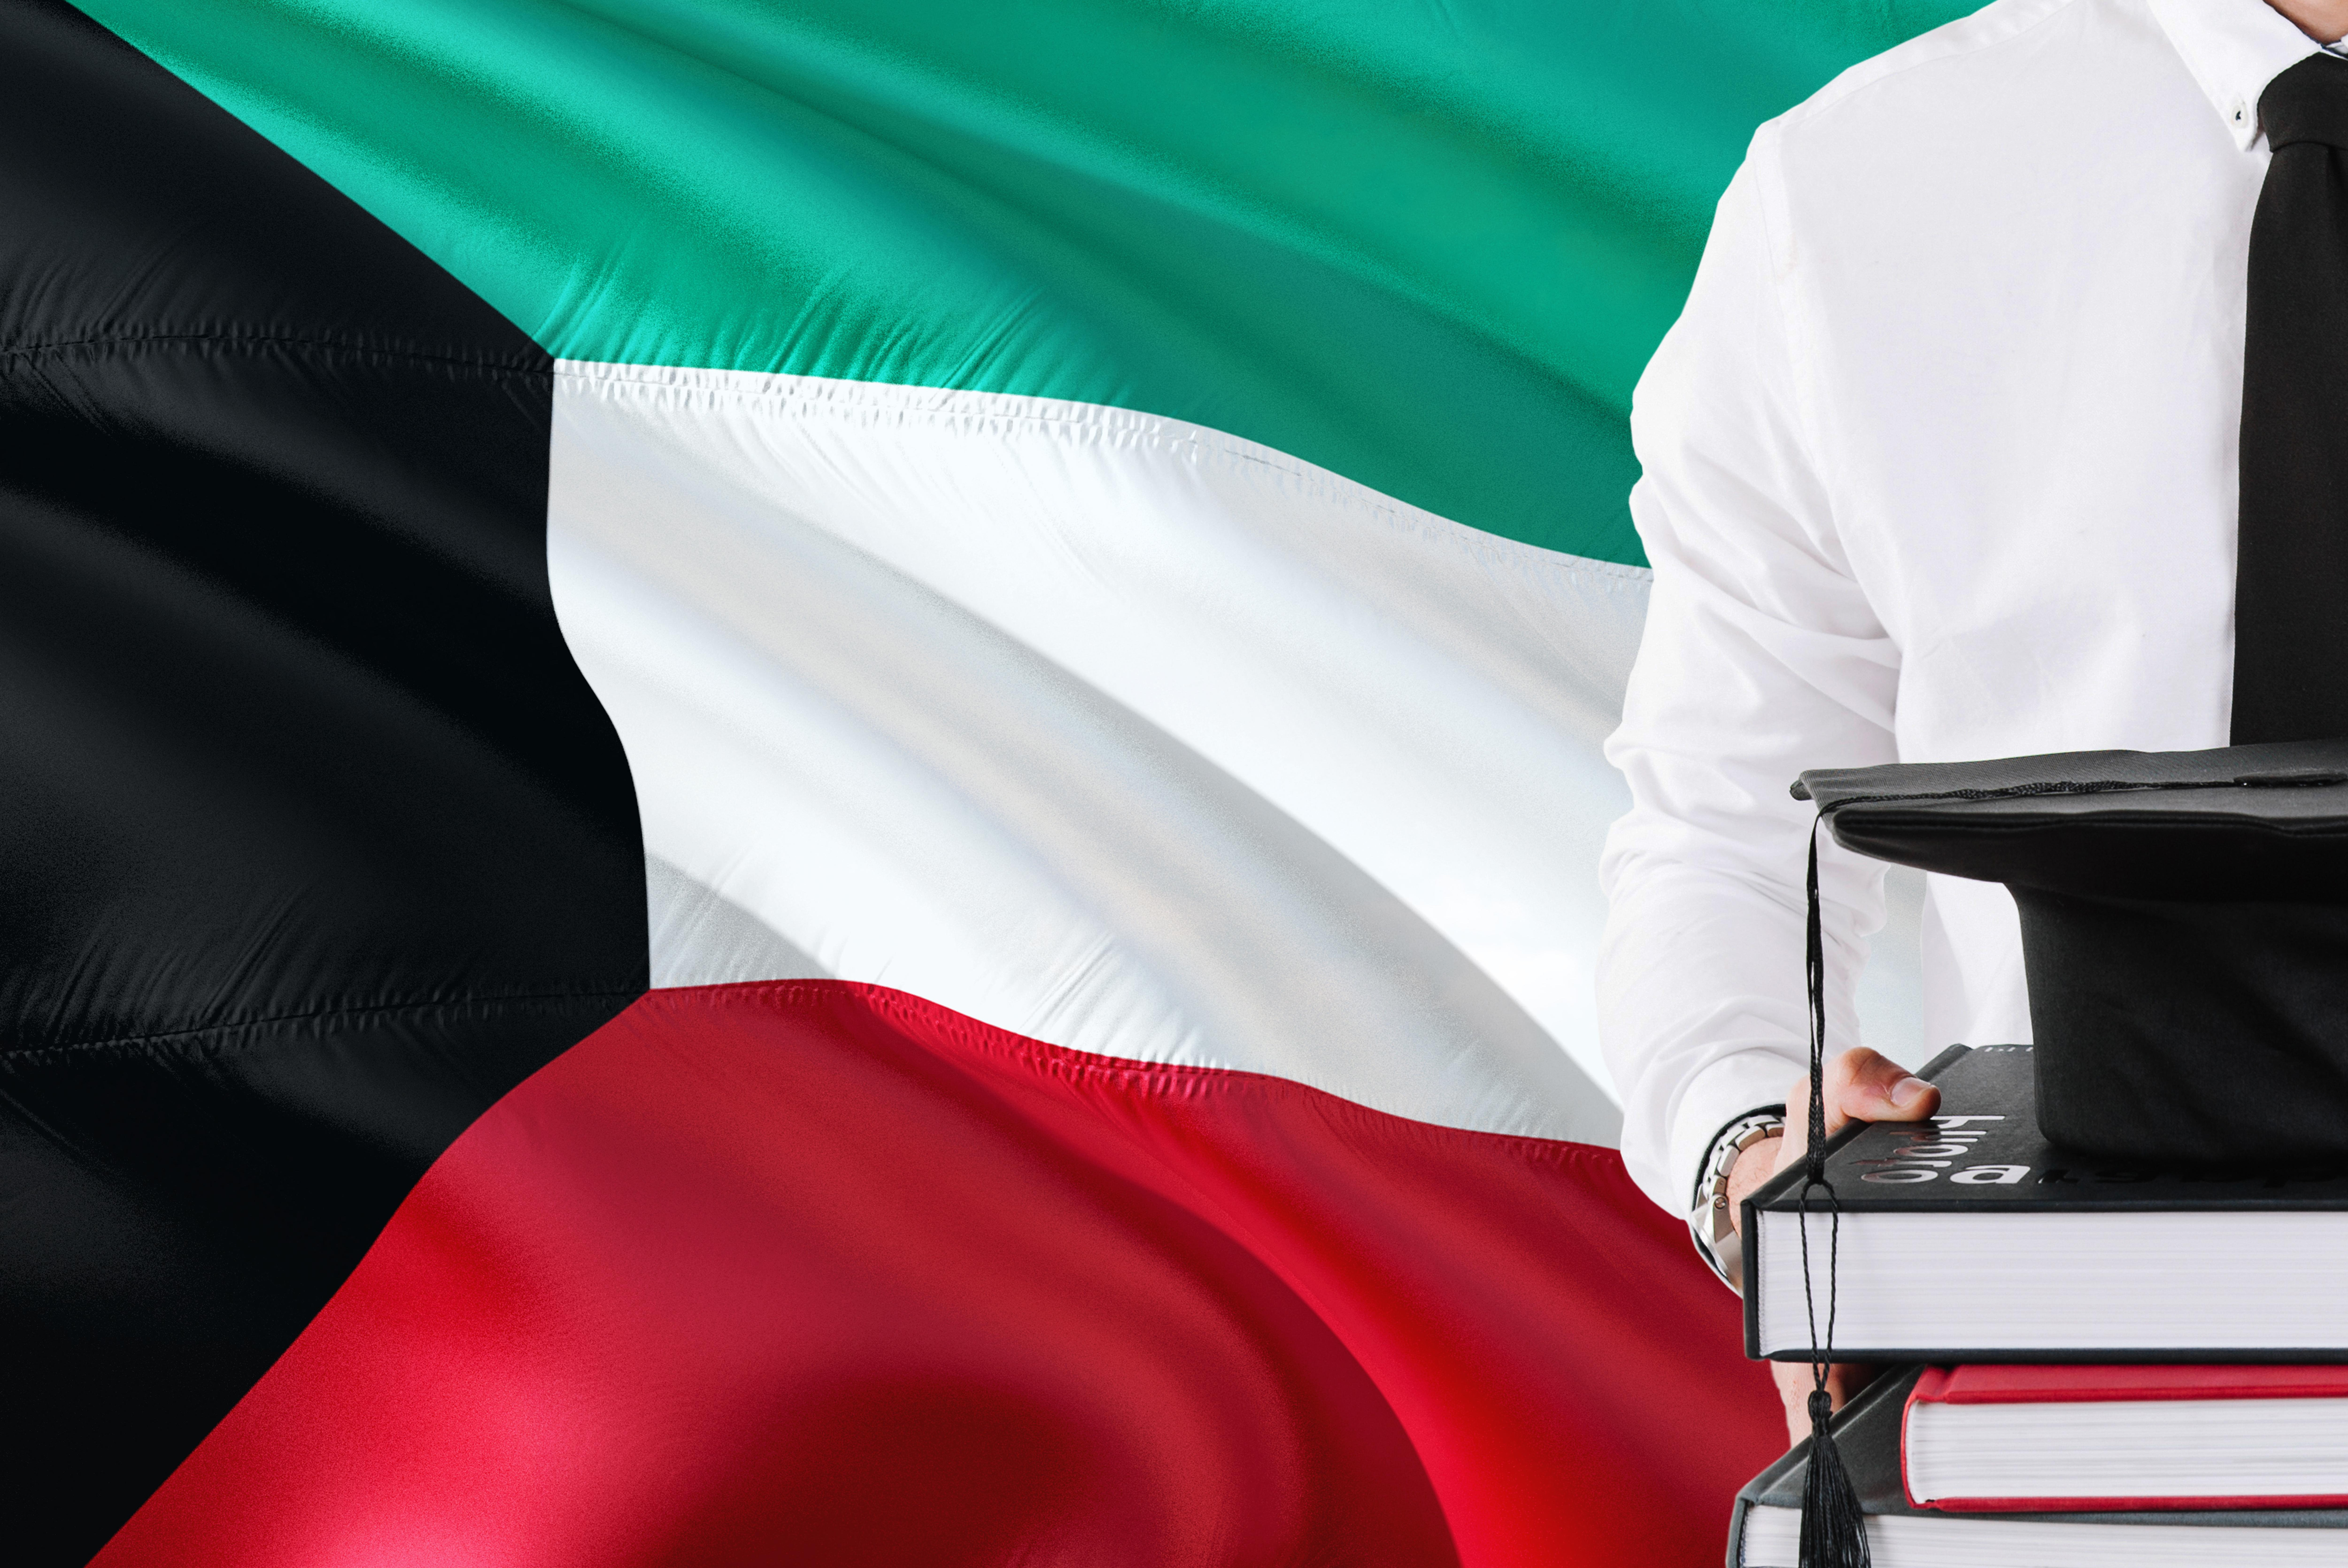 Kuwaiti student education concept. Holding books and graduation cap over Kuwait flag background.